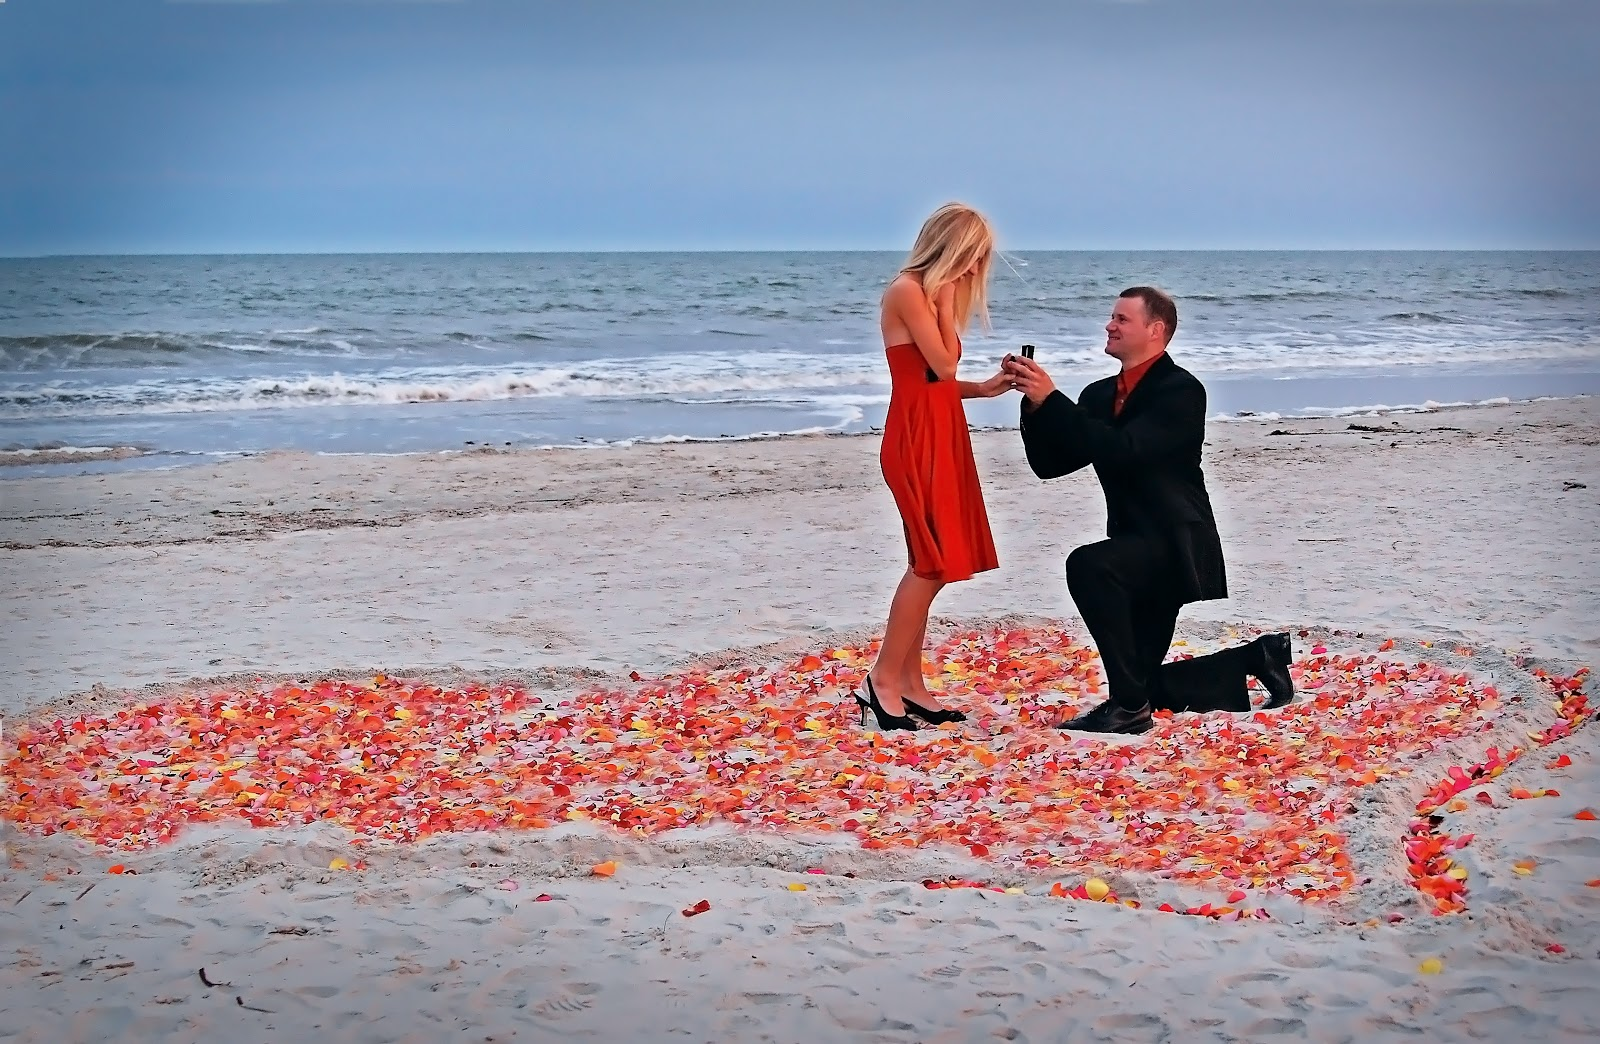 http://2.bp.blogspot.com/-C9OZPzLILSc/UTjDVwvGeDI/AAAAAAAATdI/R8KbOc1AfYs/s1600/romantice-couple-in-love+(5).jpg